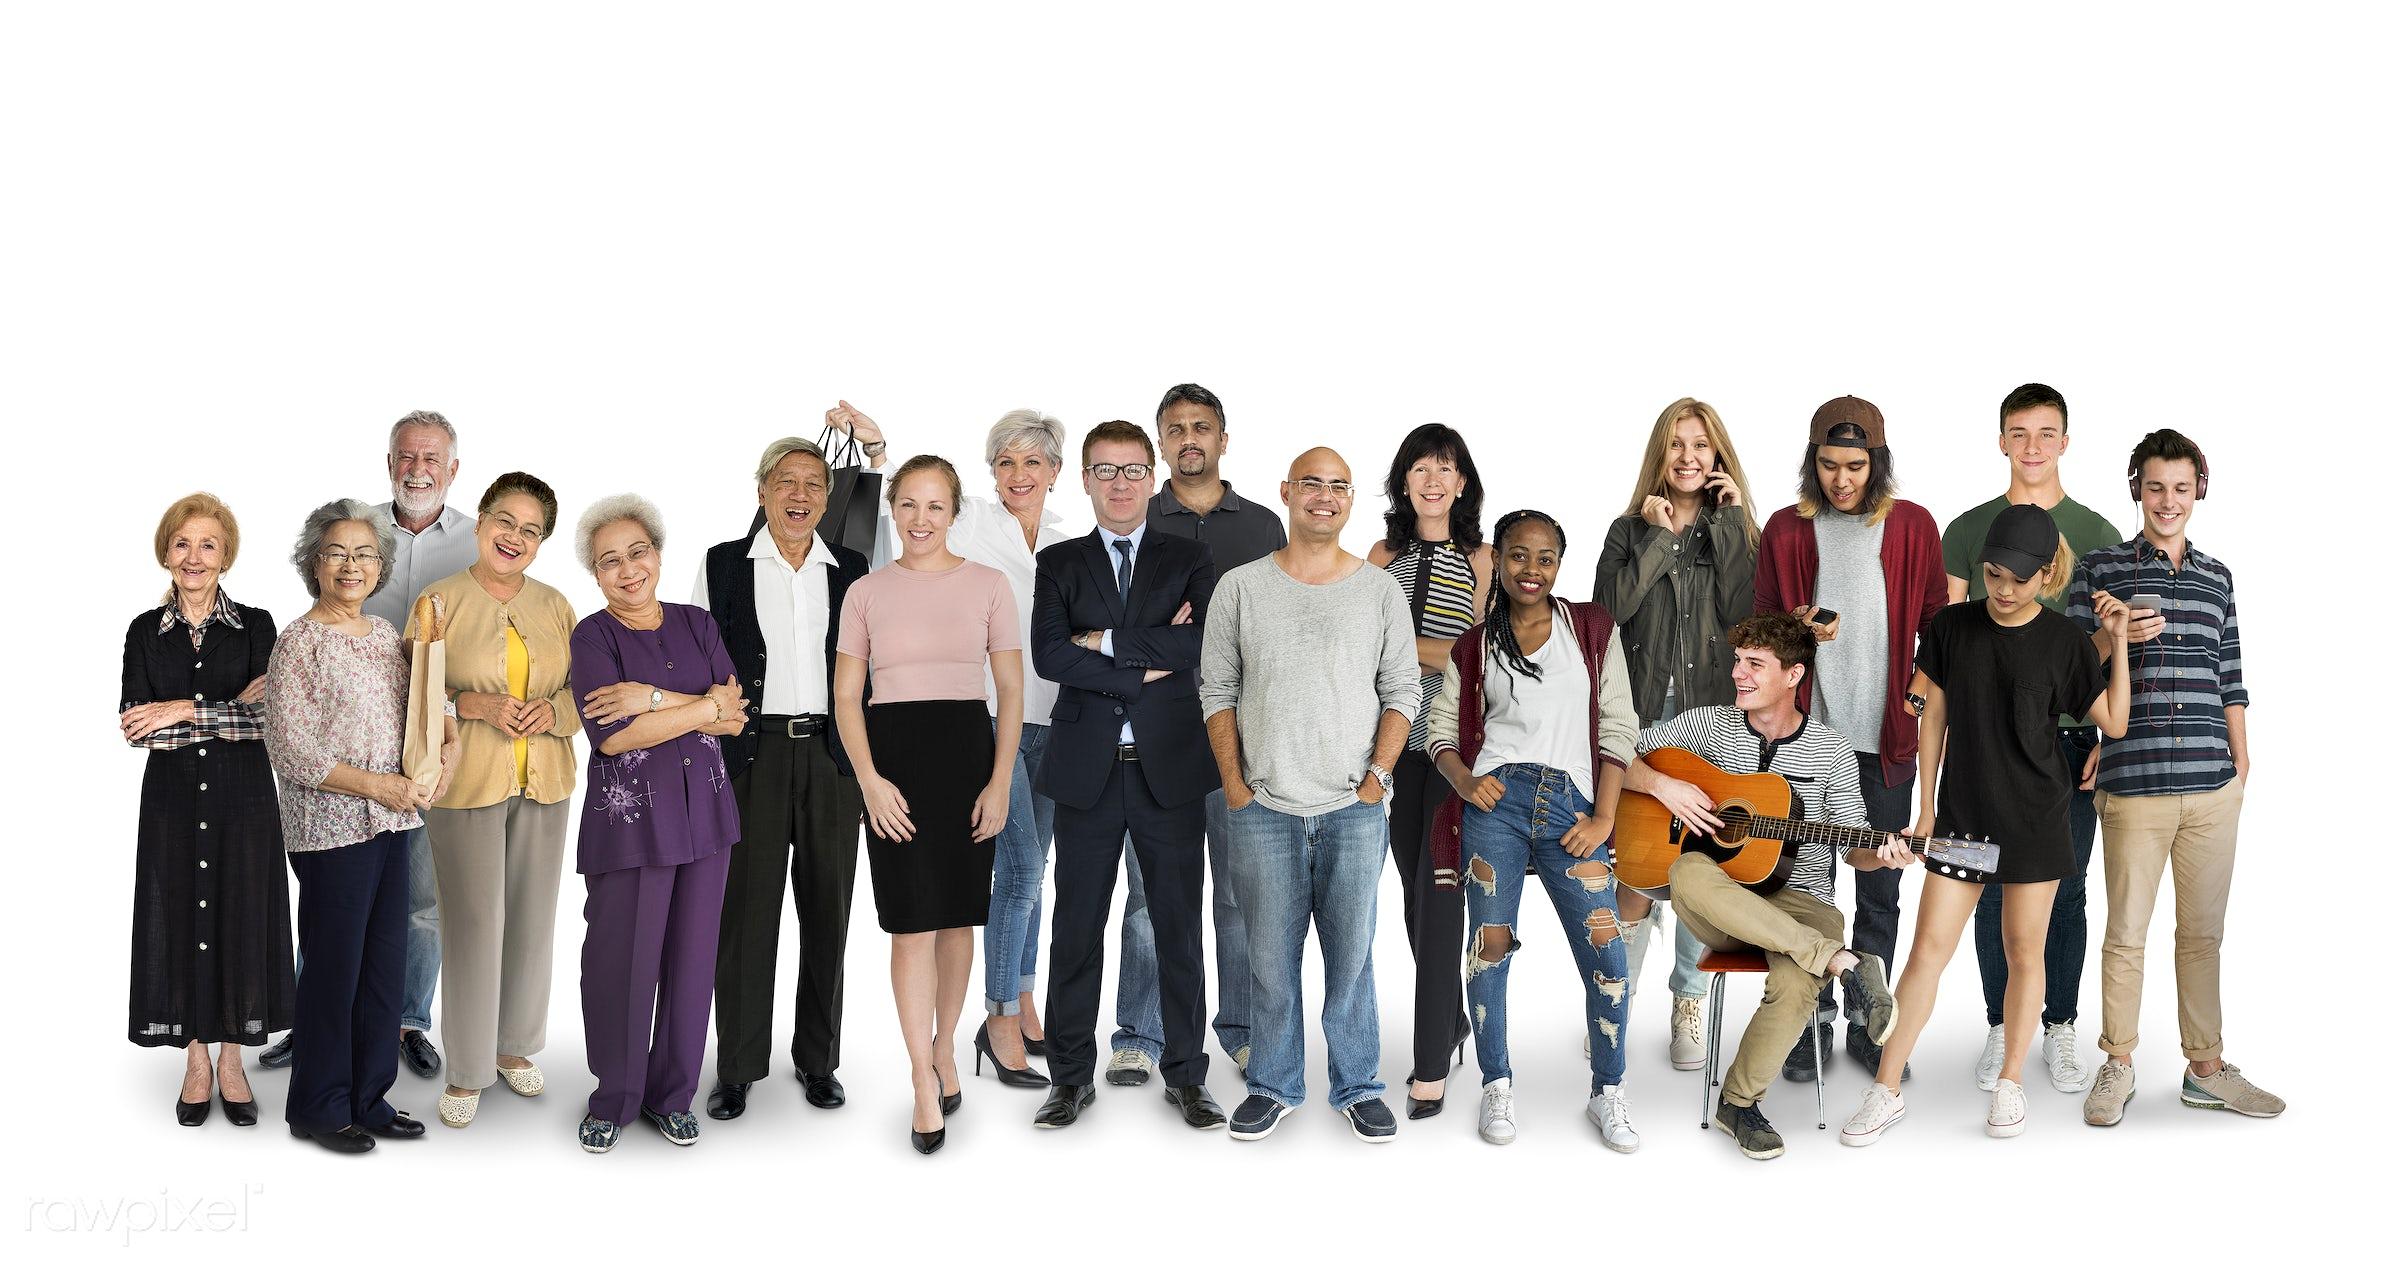 expression, studio, person, diverse, people, together, asian, caucasian, kid, retirement, woman, lifestyle, studio squareset...